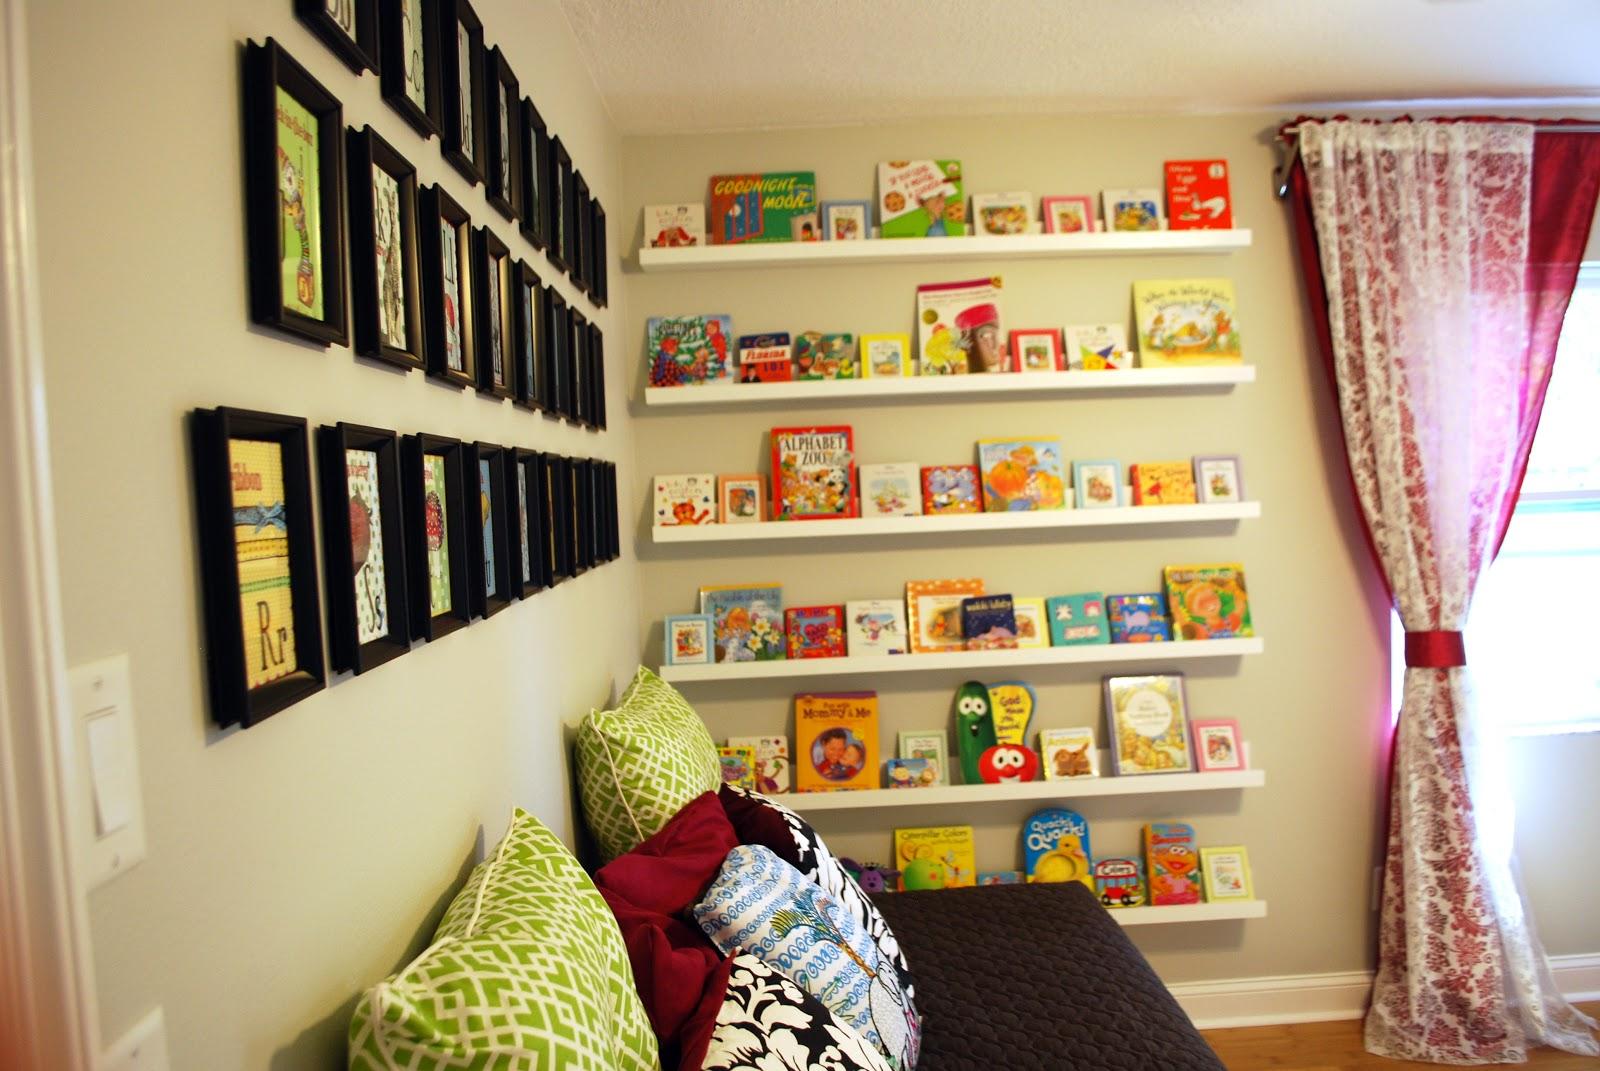 Kara\'s Korner: Nursery Room - Book Shelves Filled!